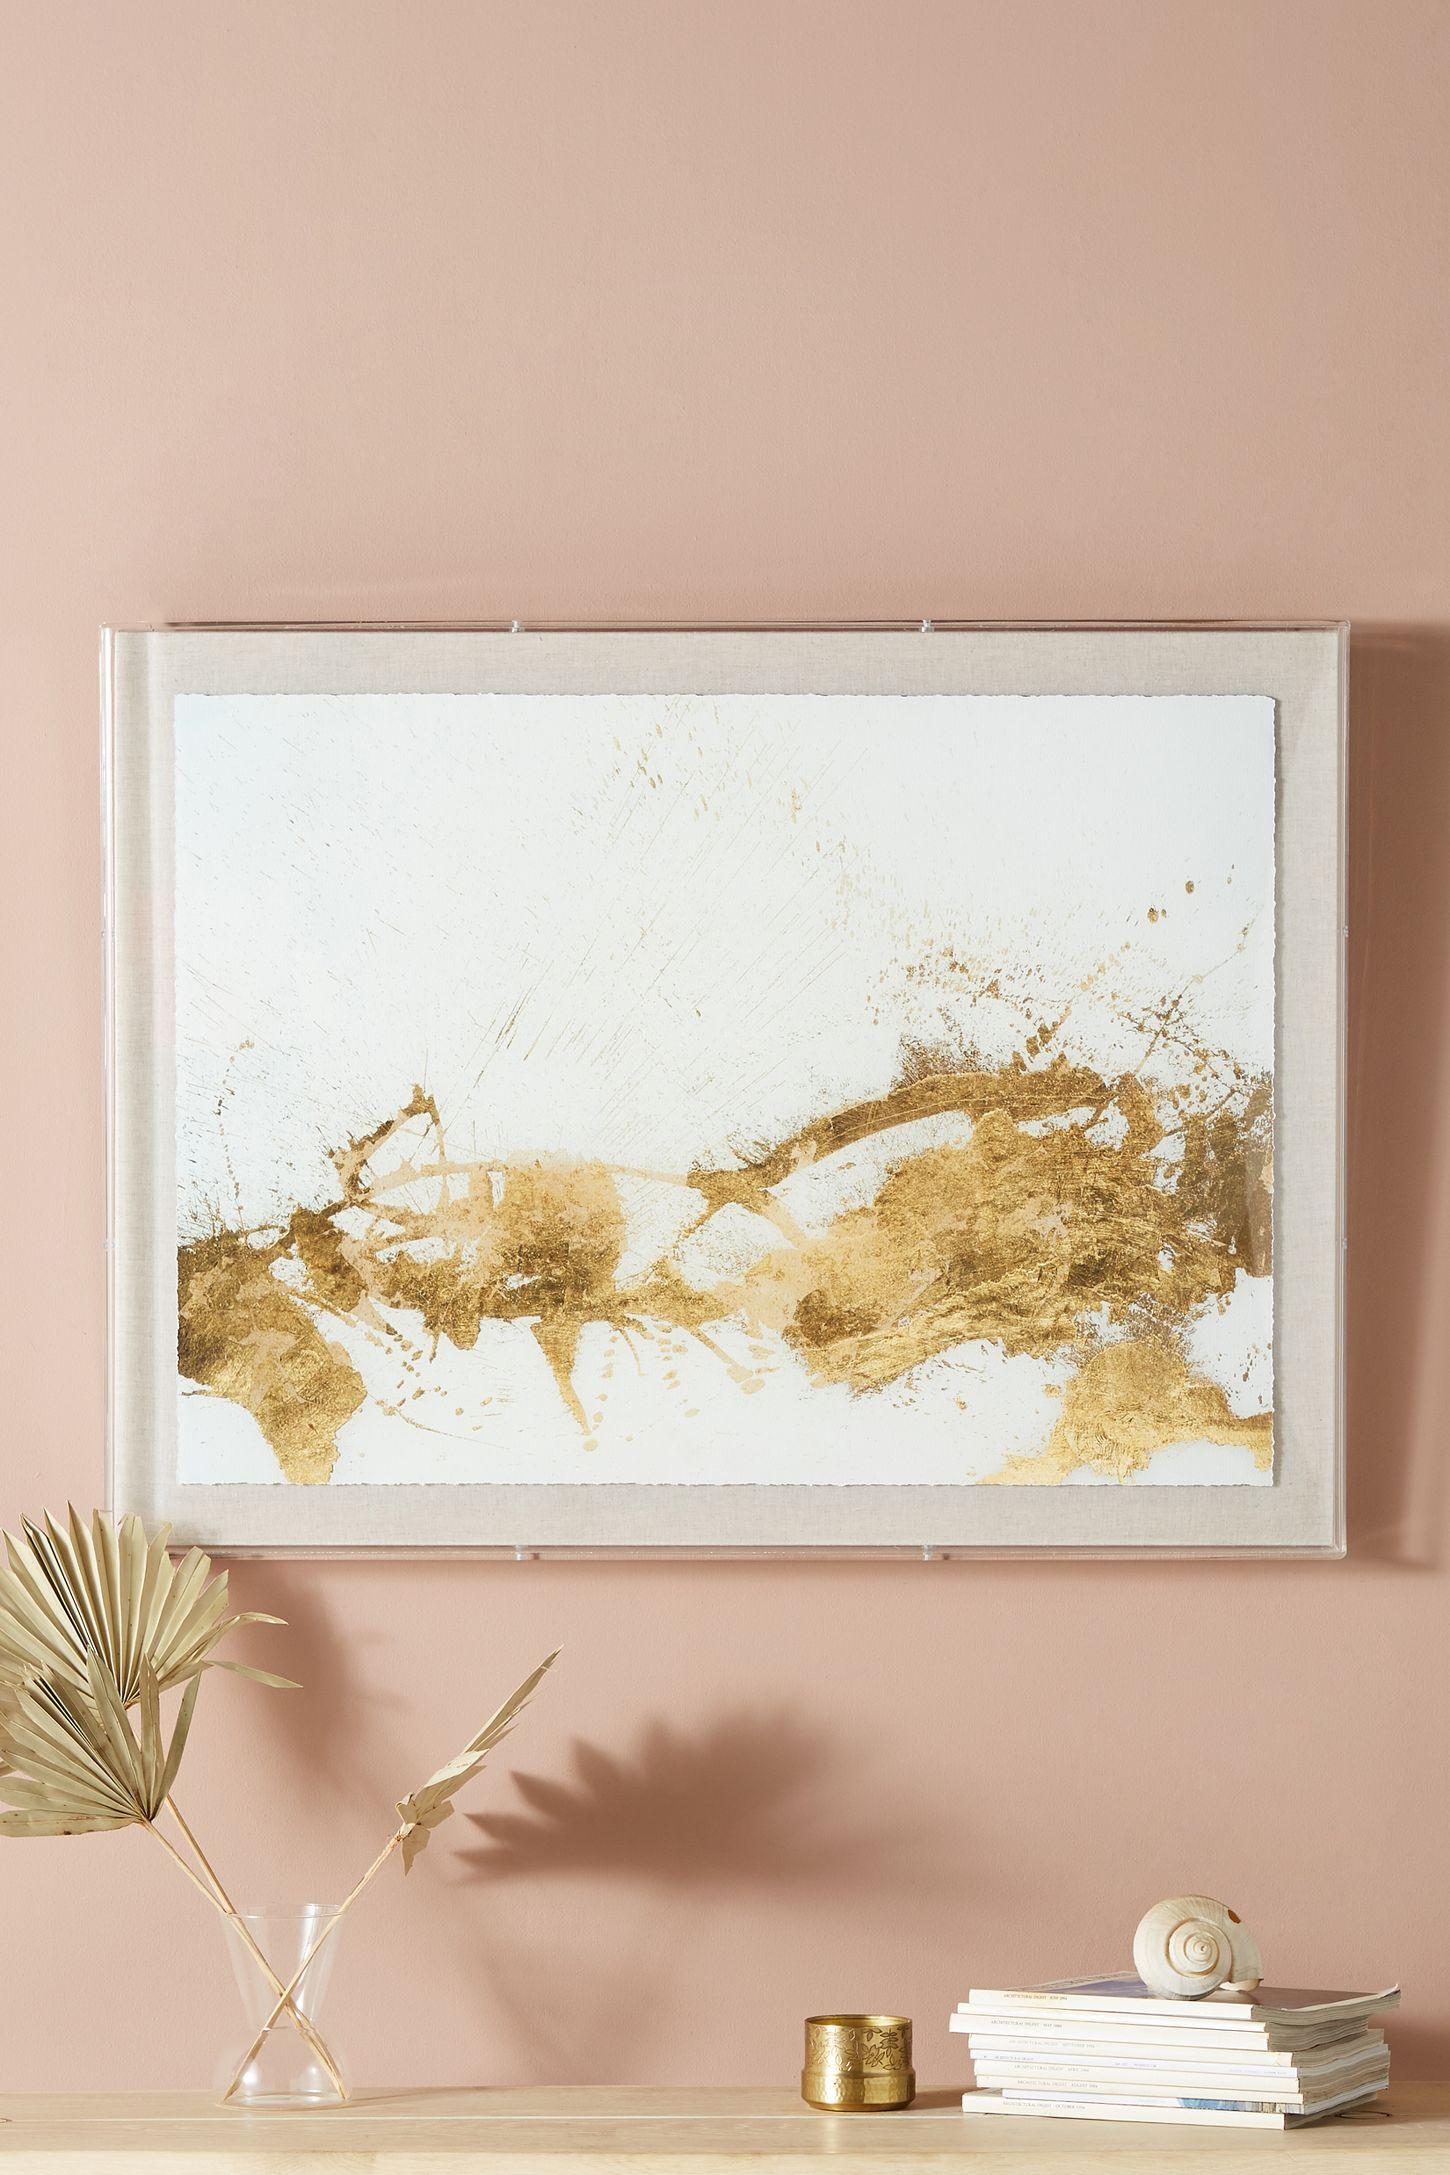 Gold Wall Art Gold  Wall Art Wall Mirrors & Wall Décor  Anthropologie